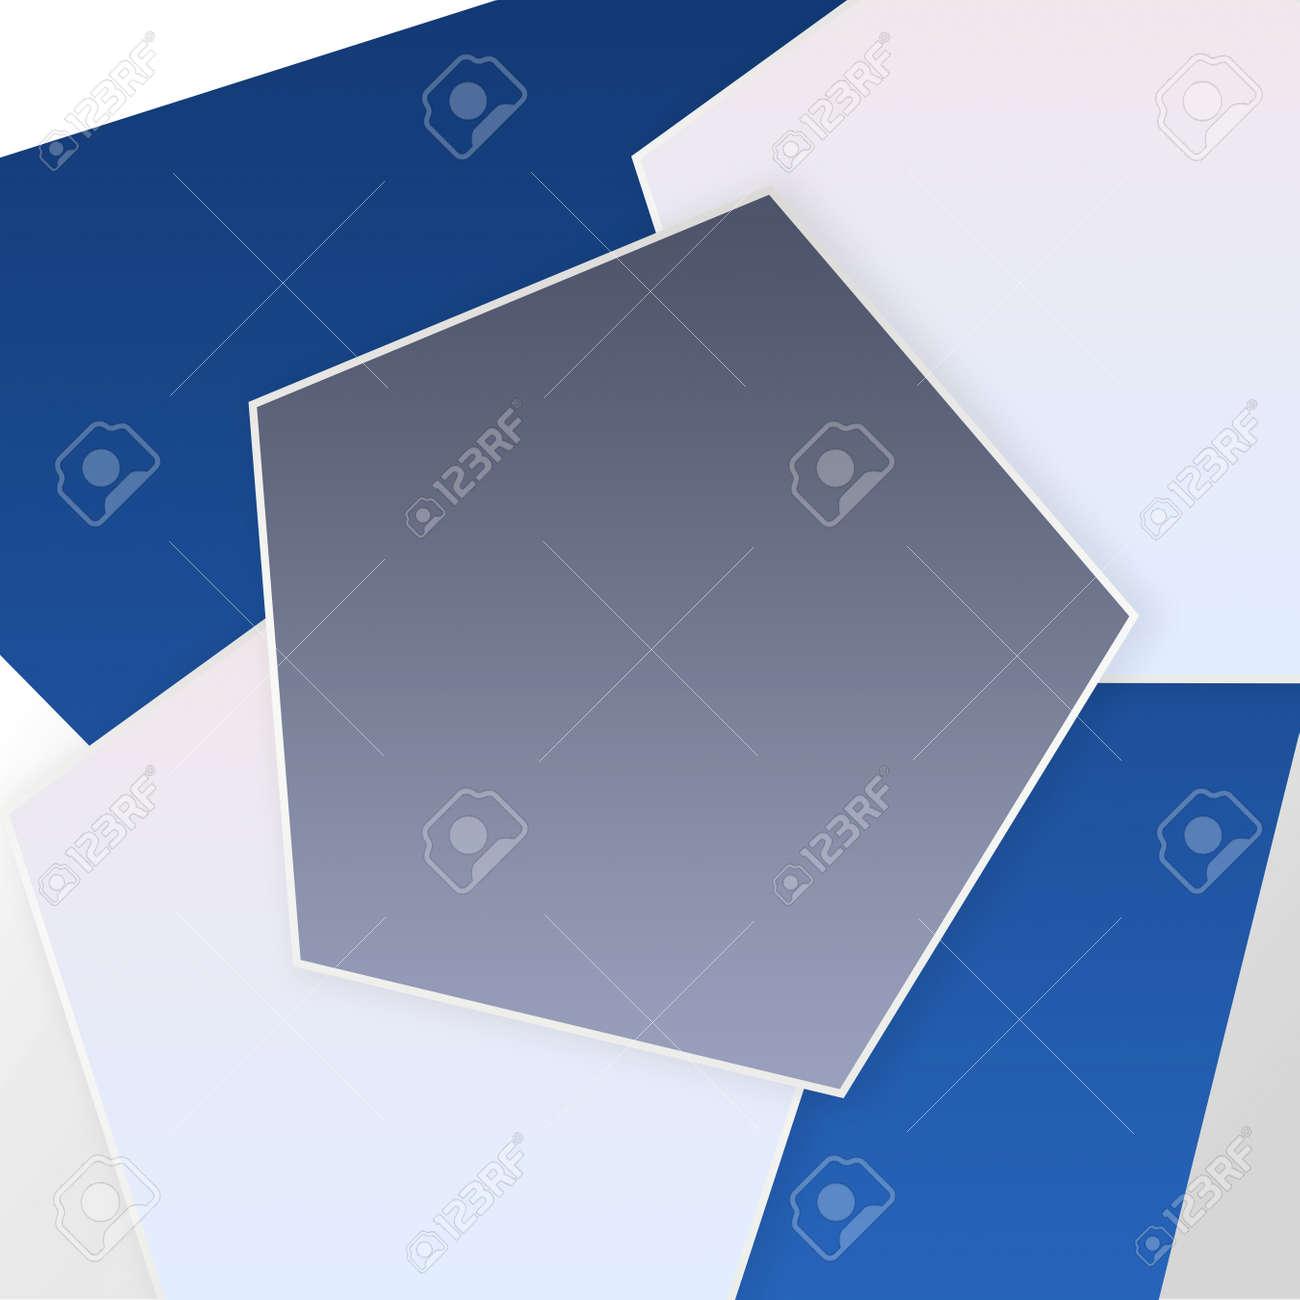 Modern Cool Empty Pentagon Design Background Template-For Banner, Poster, Card & Social Media - 152384659